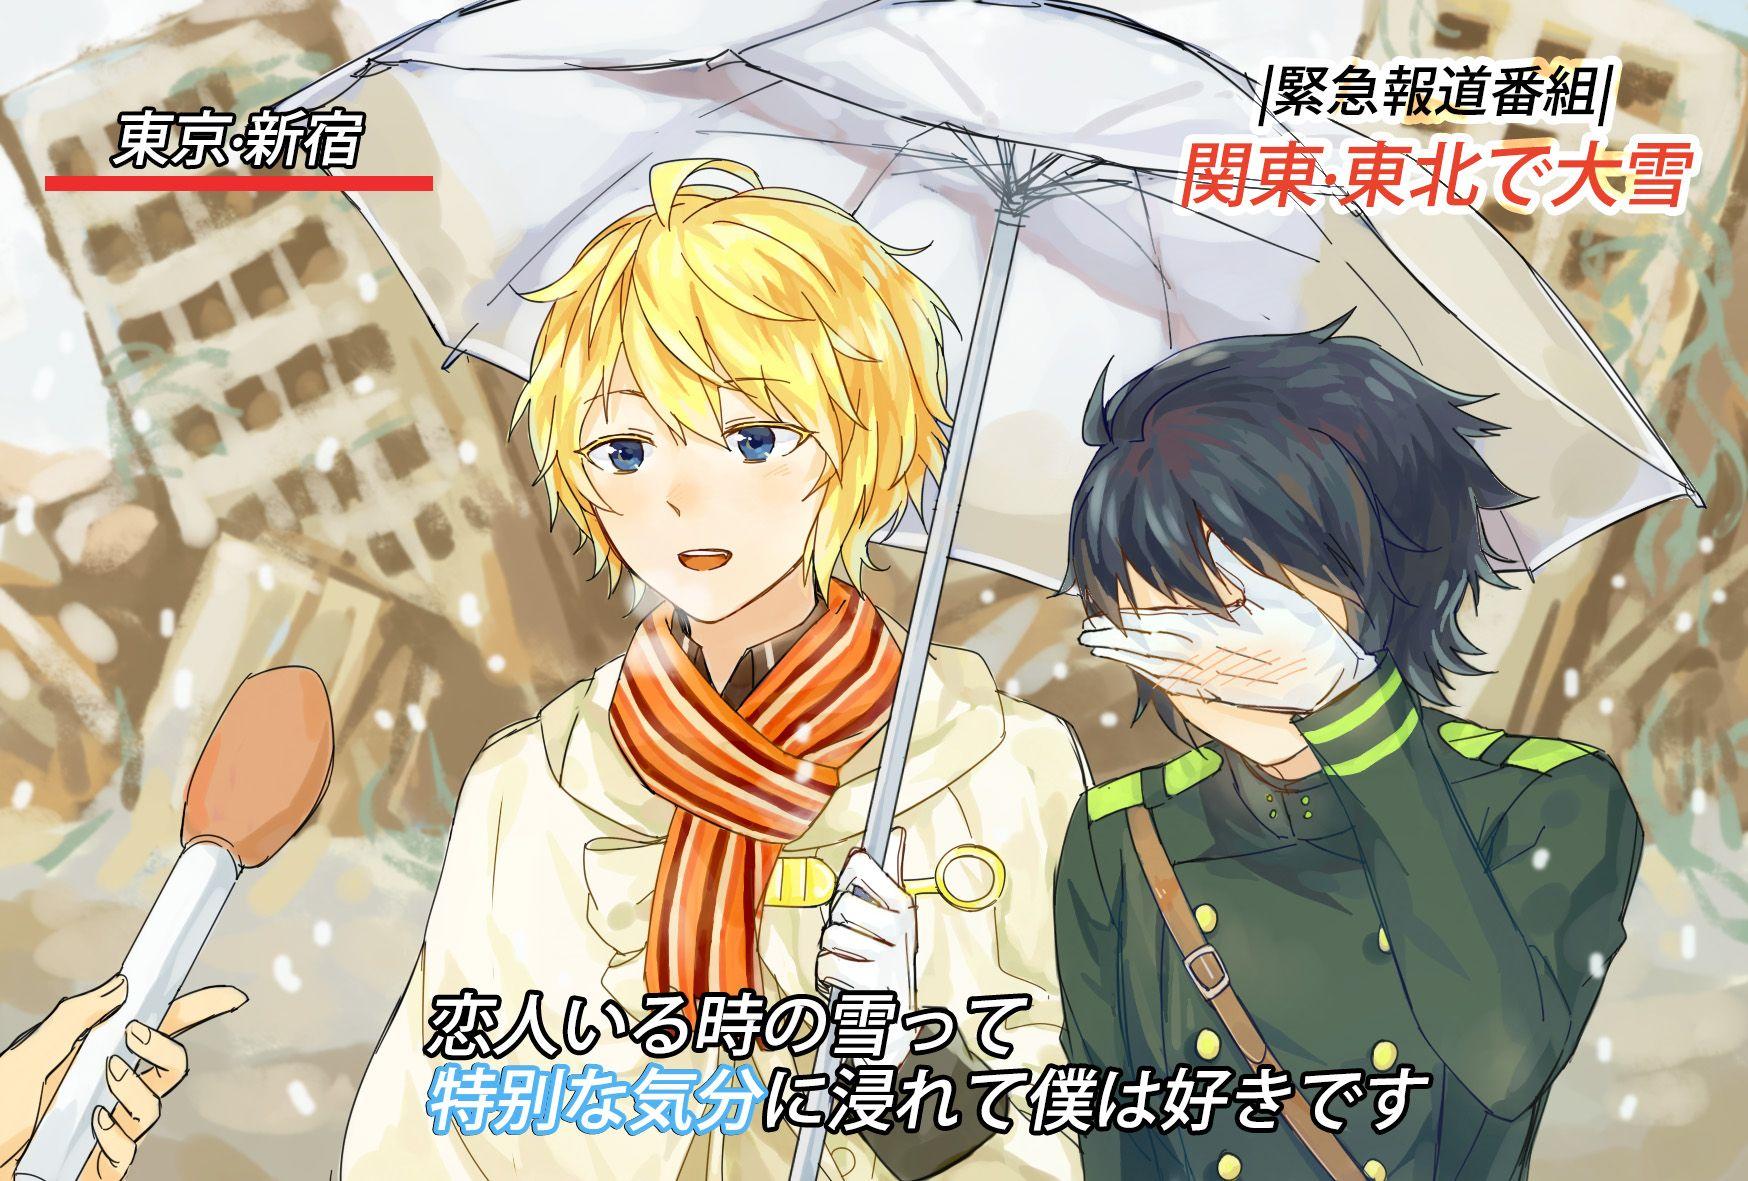 Special Feeling Meme ( Tokubetsu Na Kibun)  Owari No